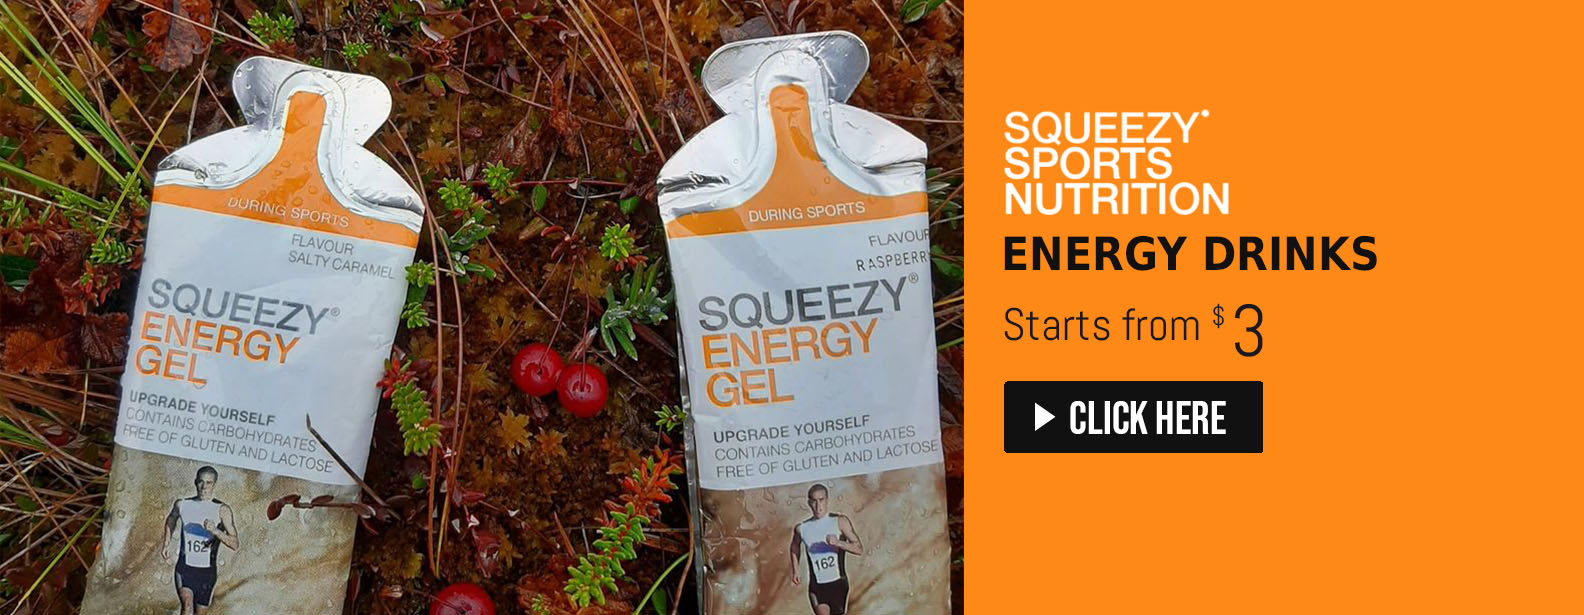 Buy Squeezy Energy Drink